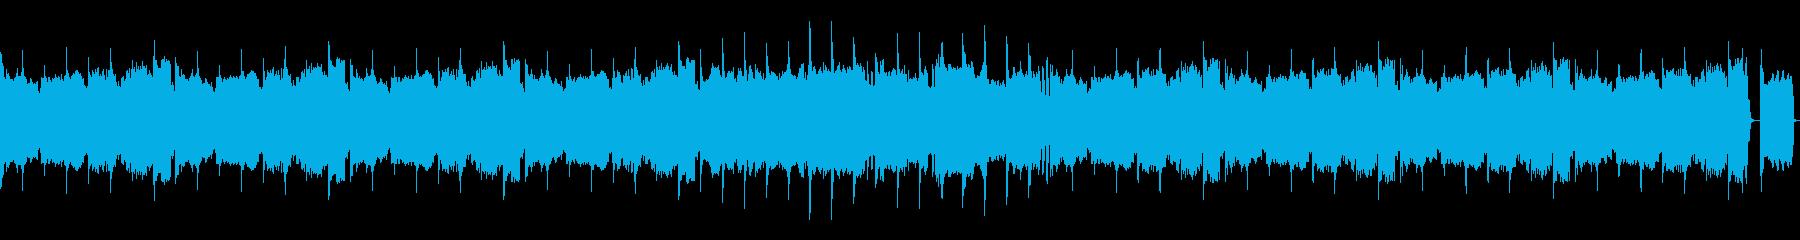 (8bit風、ドラム抜)サンバの再生済みの波形